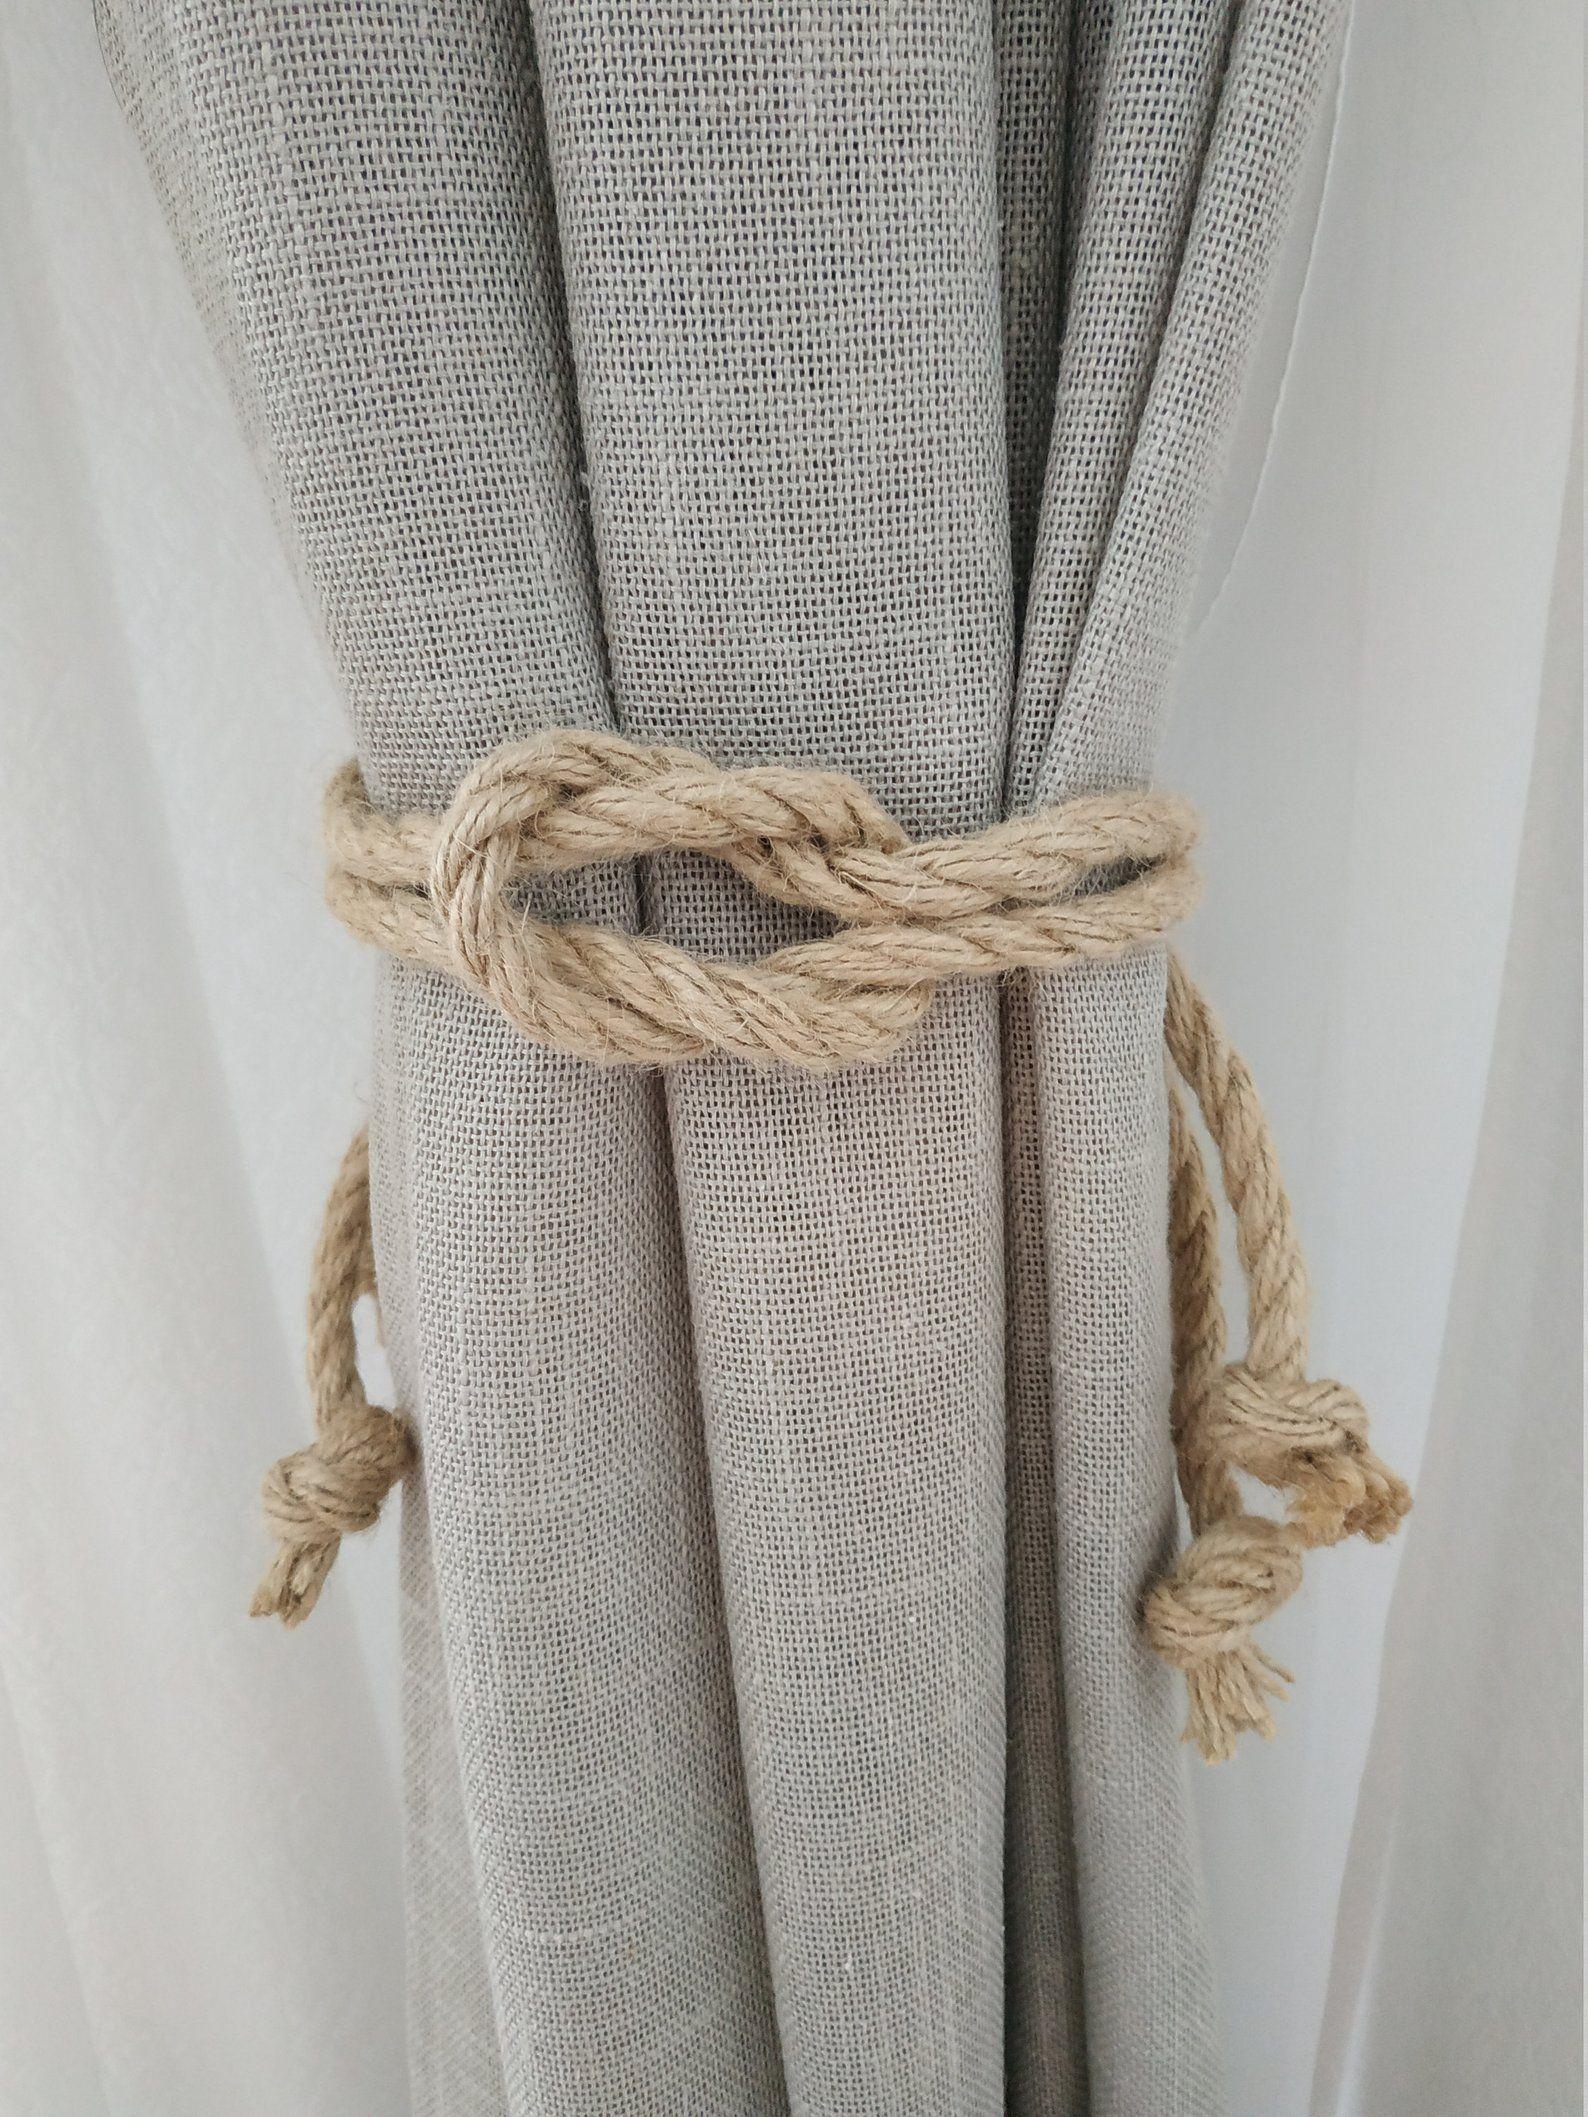 Square Knot Curtain Tie Back Beach Decor Jute Rope Curtain Etsy Rope Decor Rope Curtain Tie Back Curtain Tie Backs